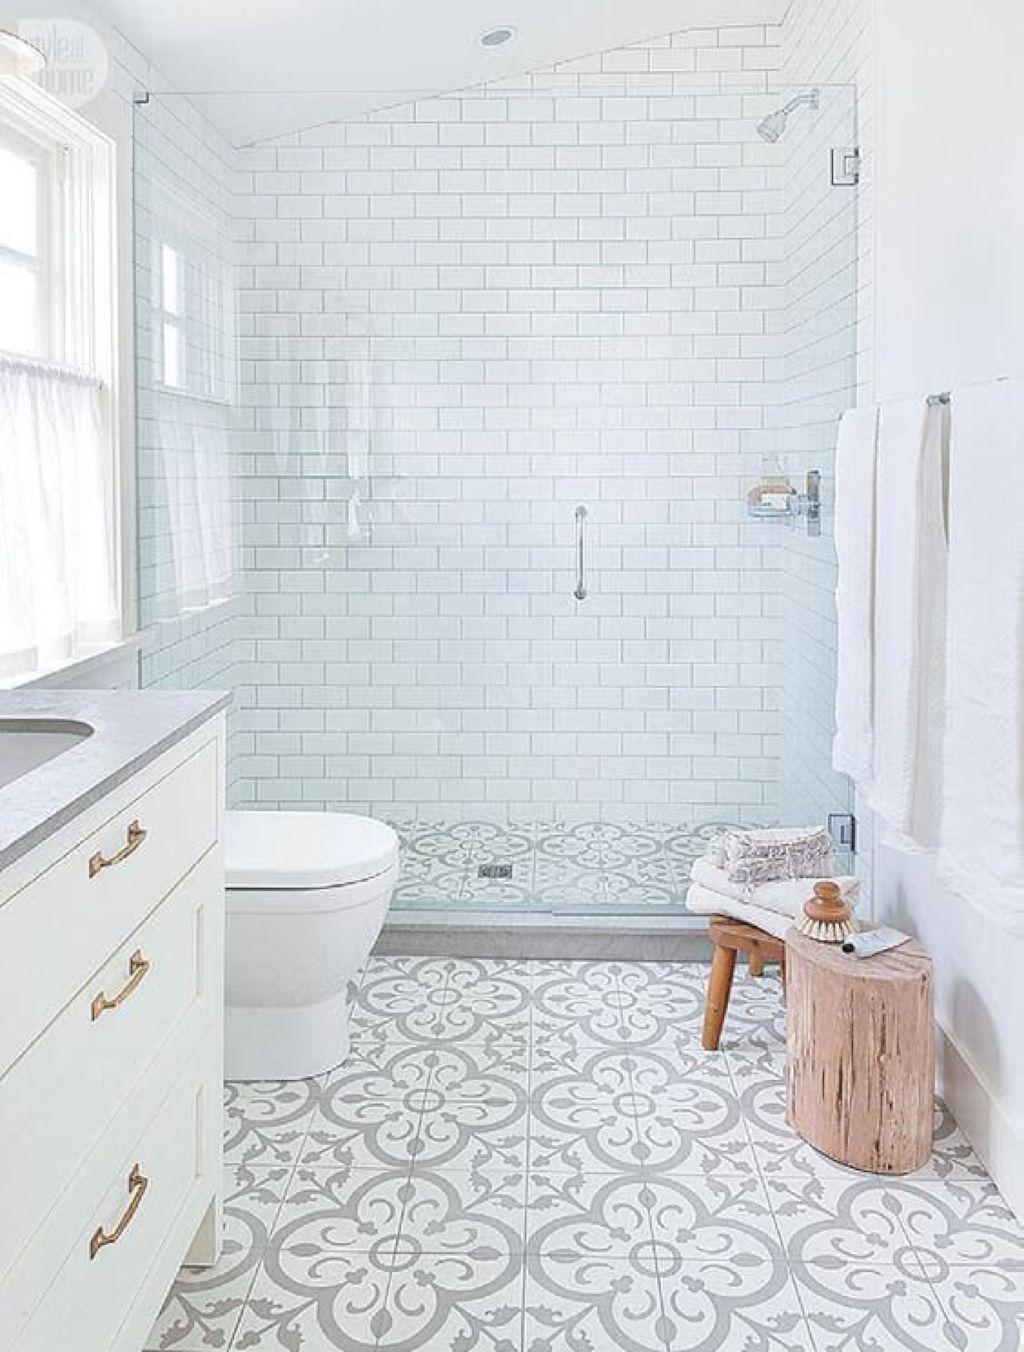 55 awesome small bathroom design ideas 2018 shower only bathroom rh pinterest com